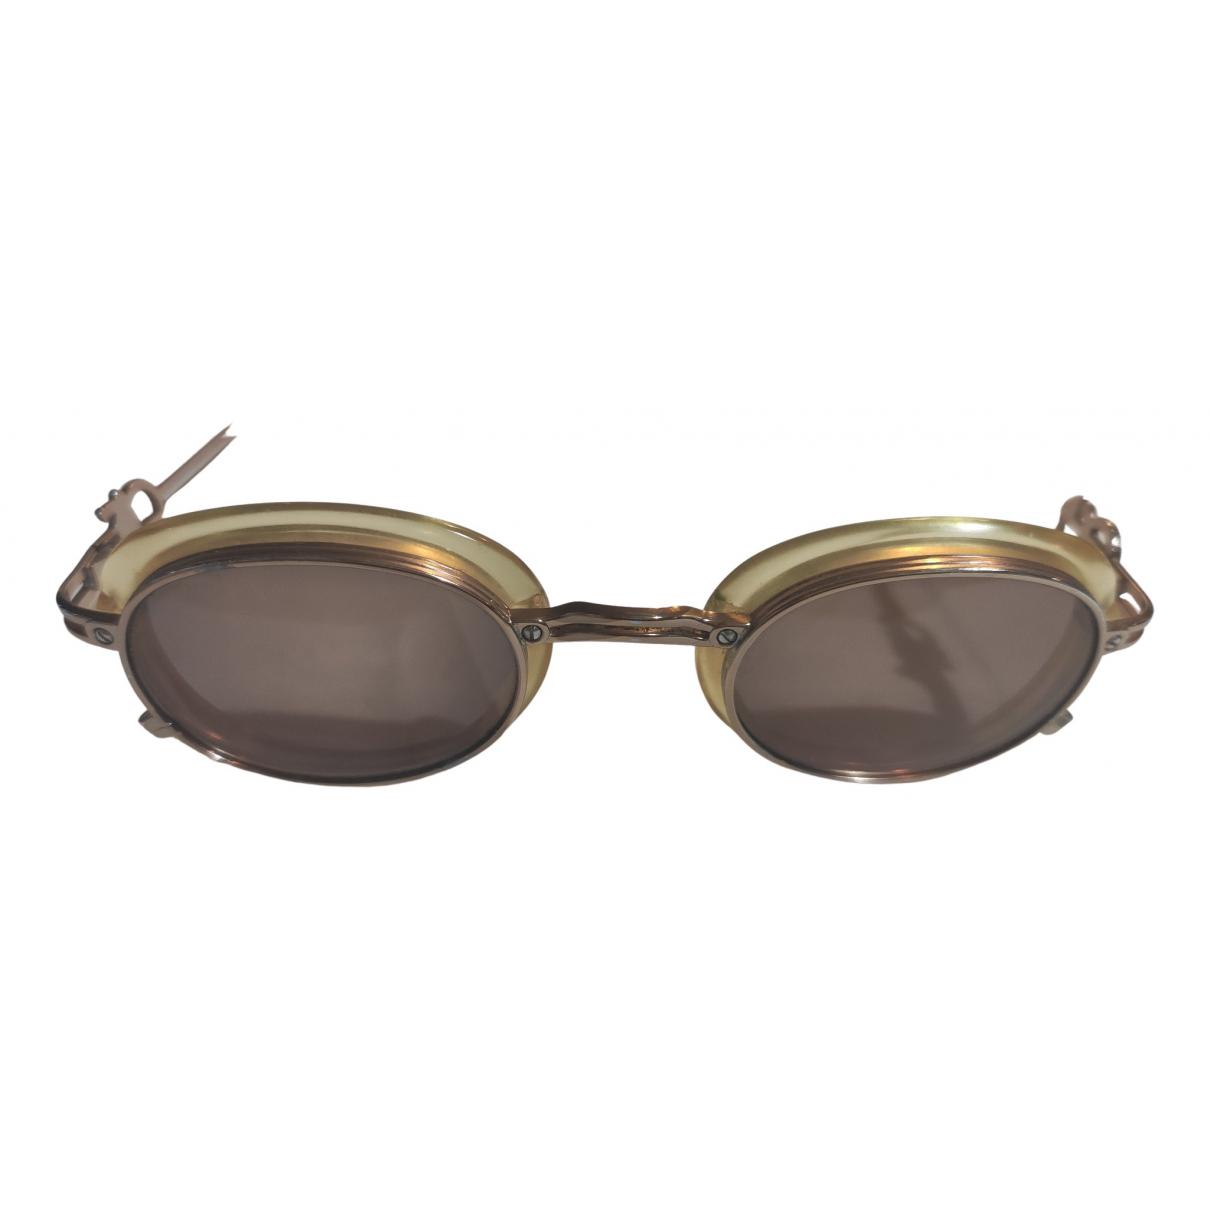 Jean Paul Gaultier N Gold Metal Sunglasses for Women N